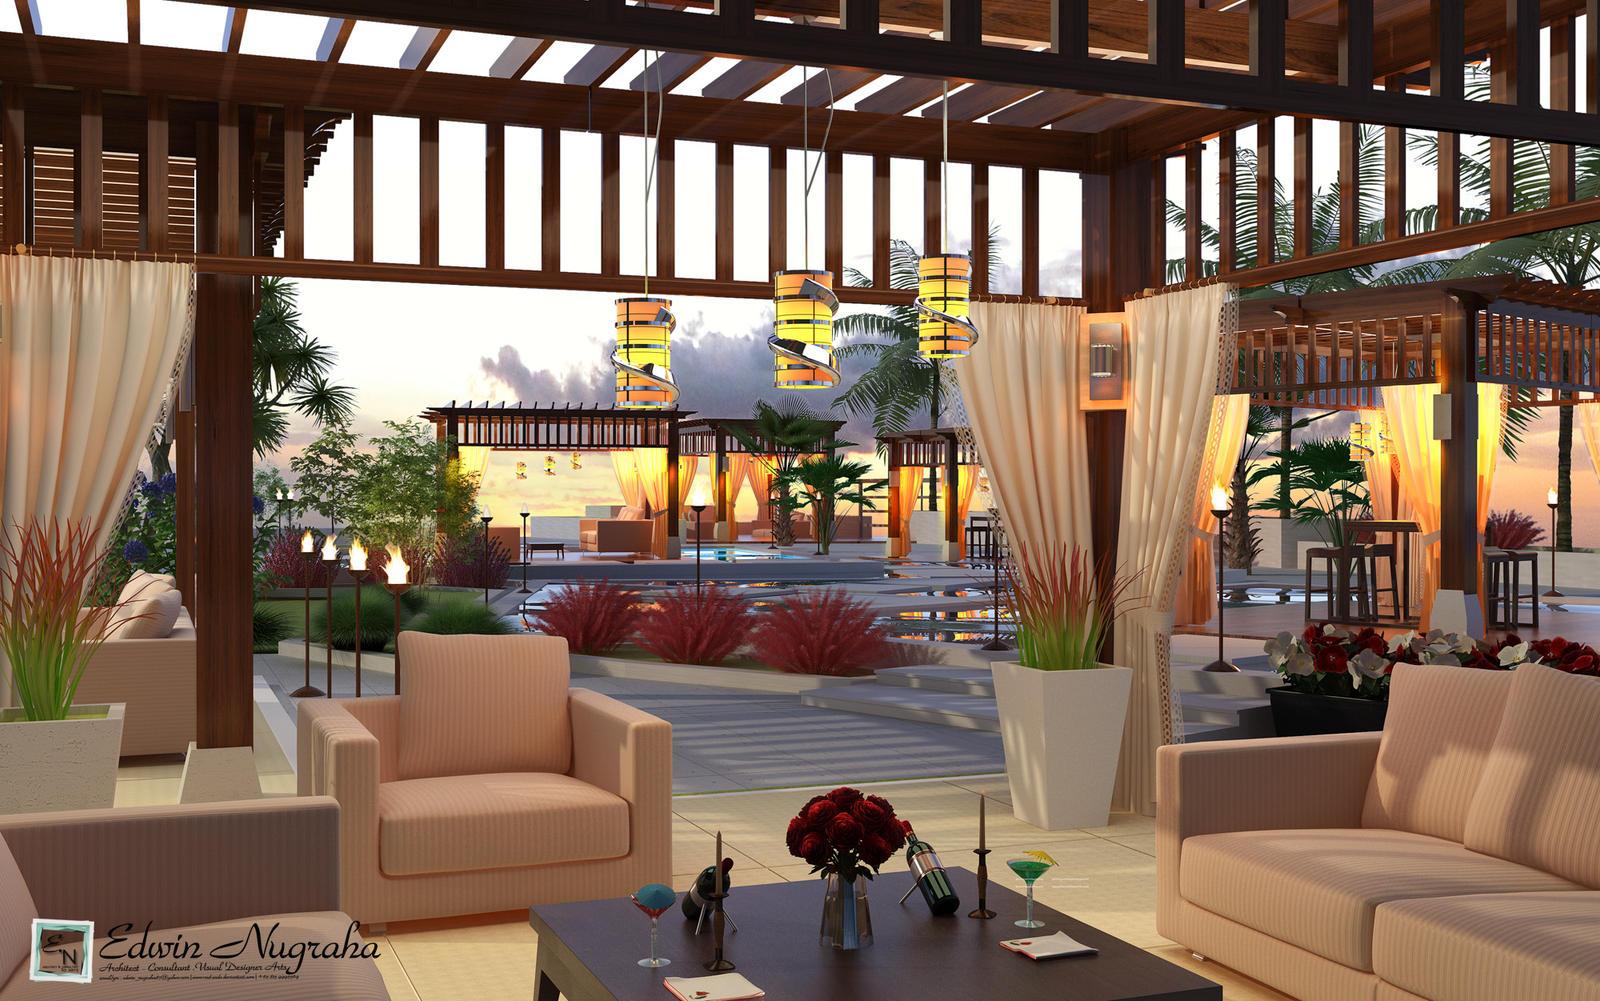 Mahakam hotel roof garden by vad endz on deviantart